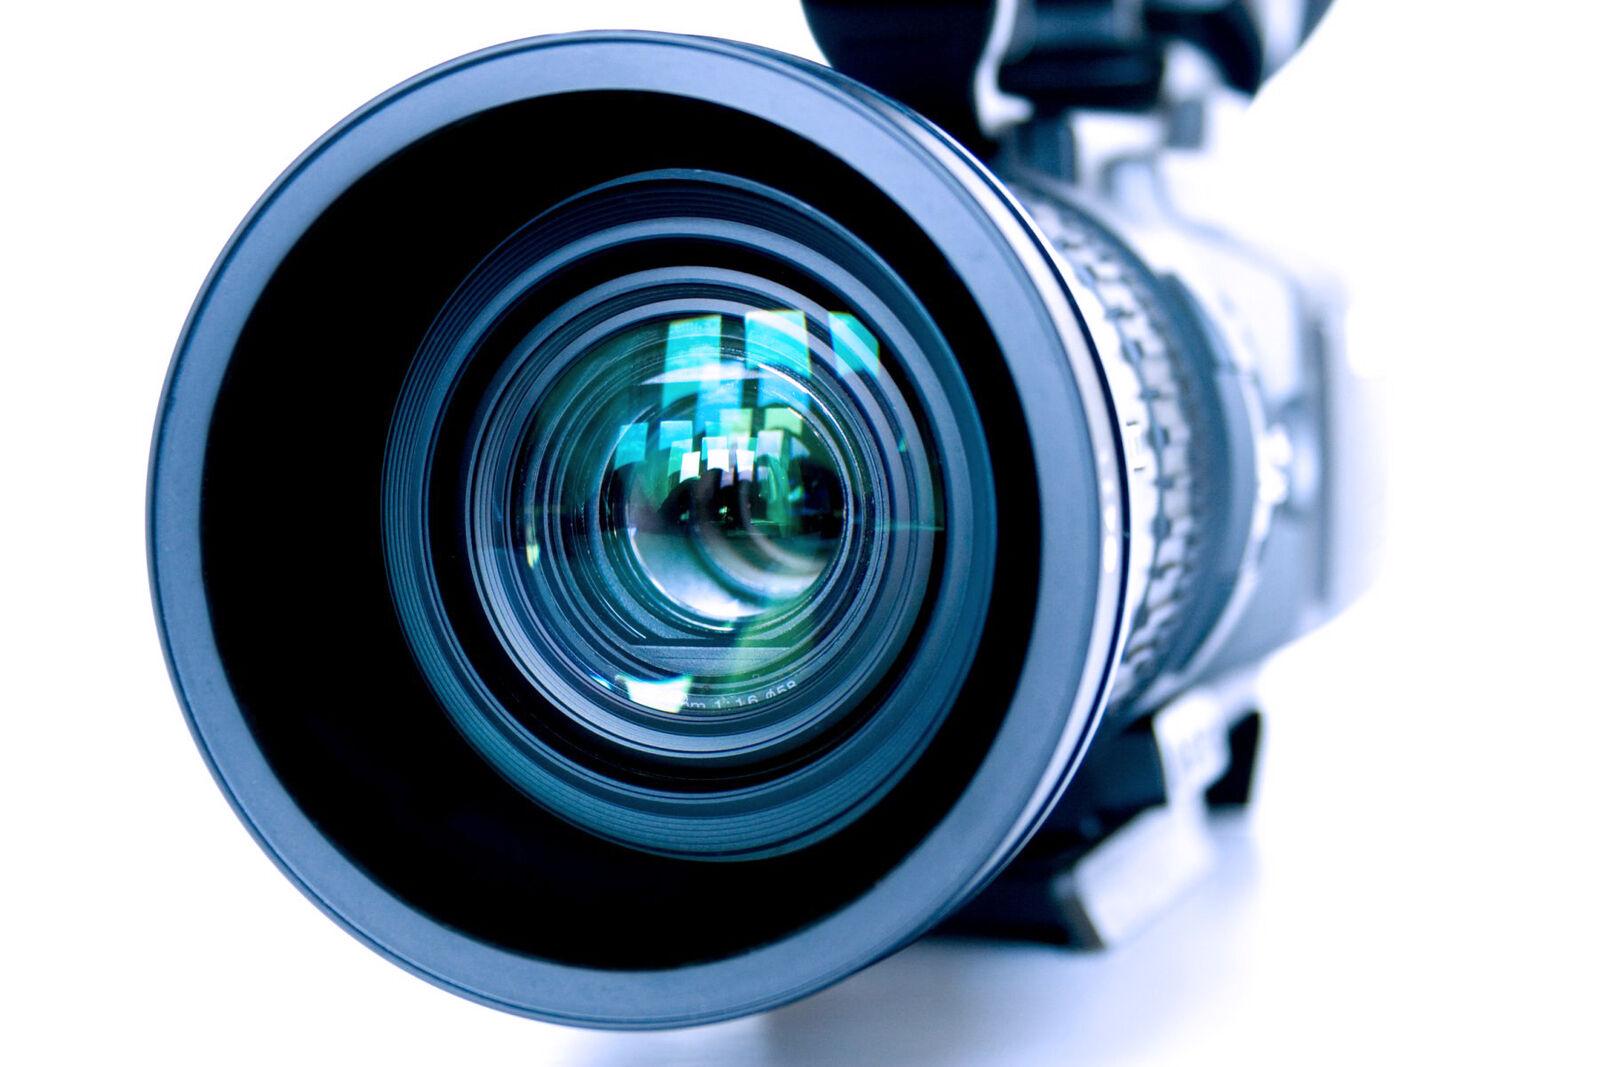 Lens fotografia y video 29